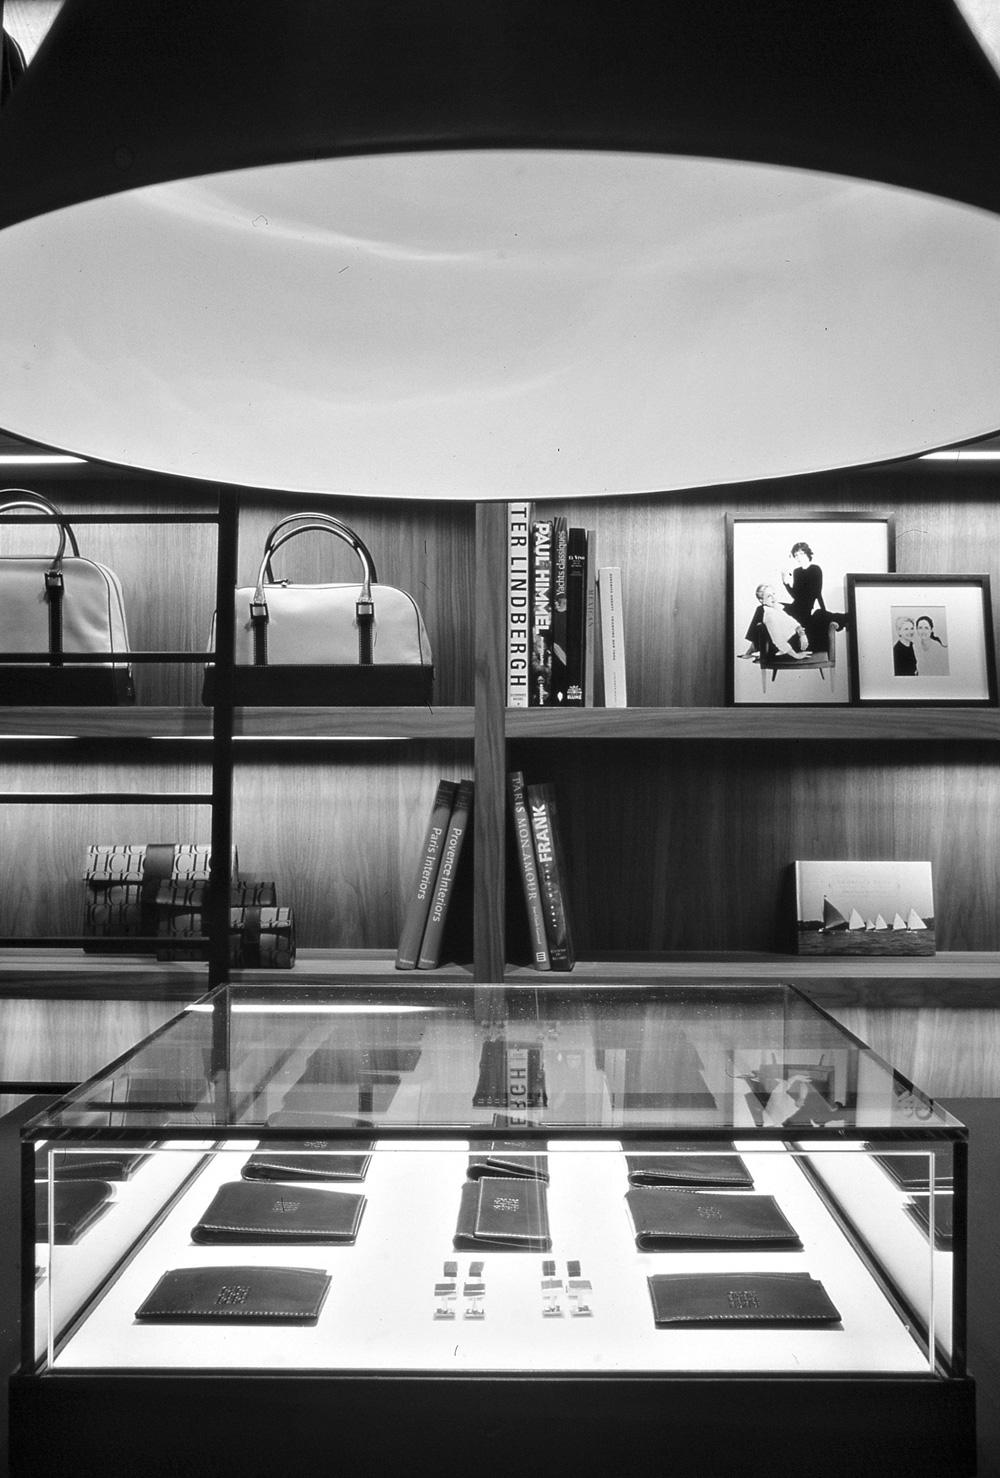 Carolina S Cake Design Store Frosinone : Elsa Urquijo Architects architecture & design projects